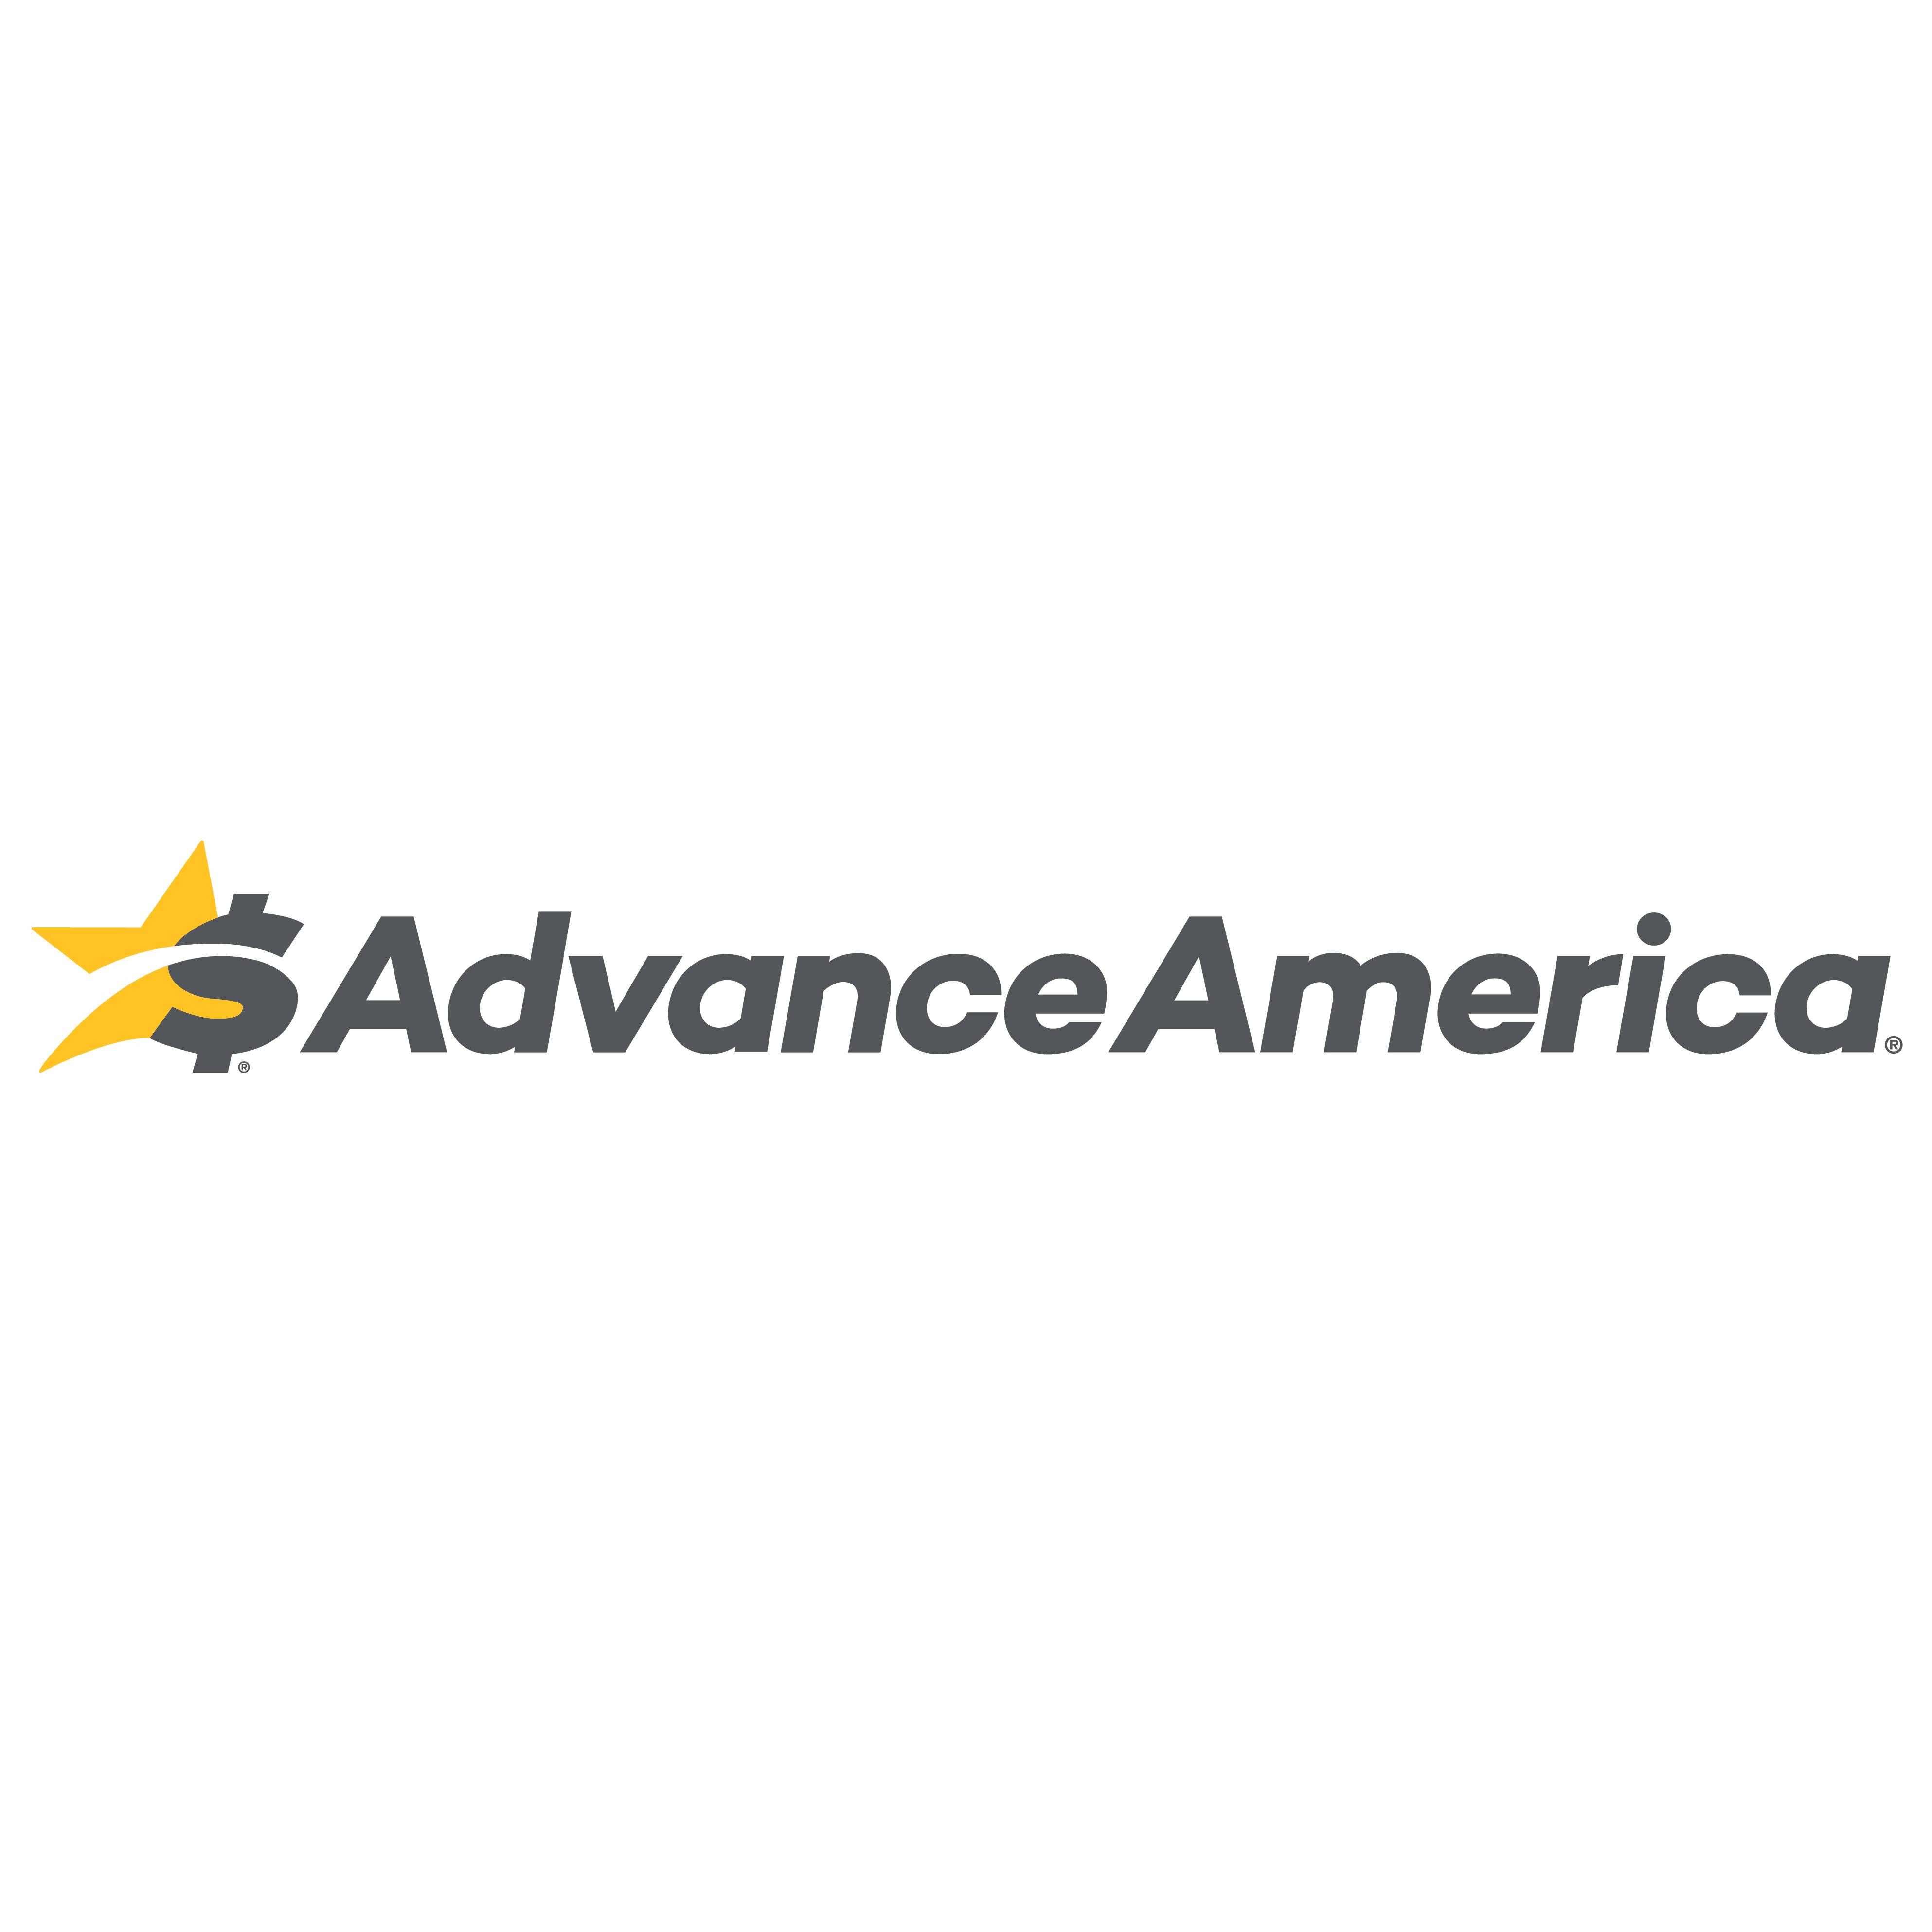 Loan advance pdf picture 7